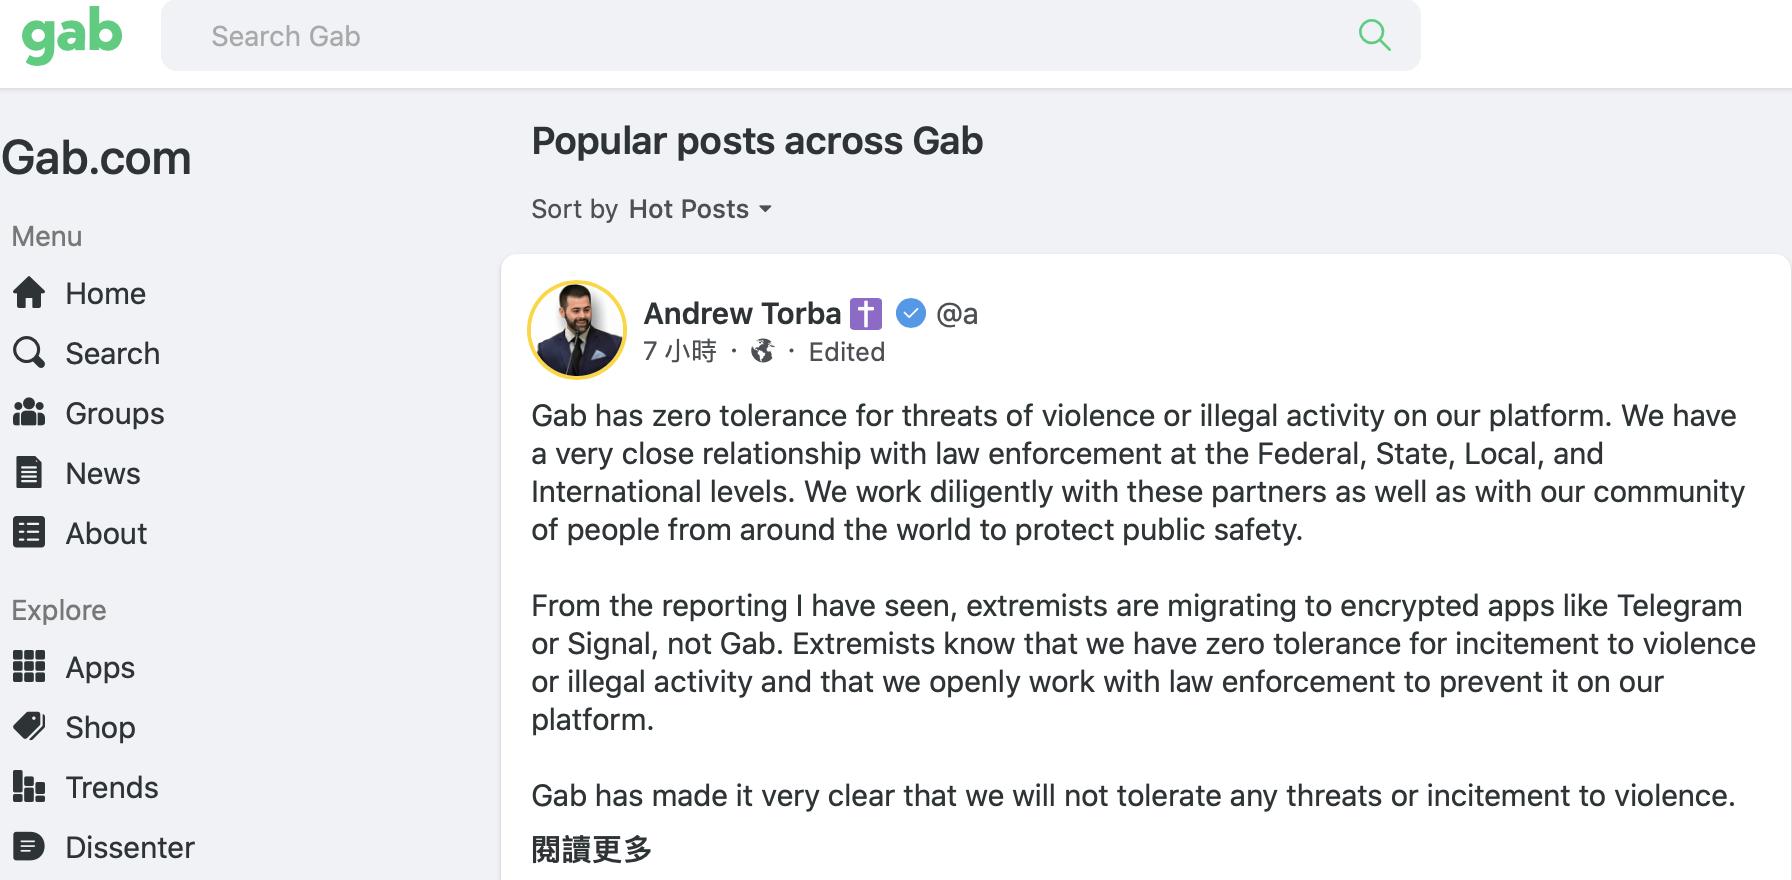 Gab反對非法內容和煽動暴力,但允許除色情內容外的所有合法言論。(Gab網站截圖)